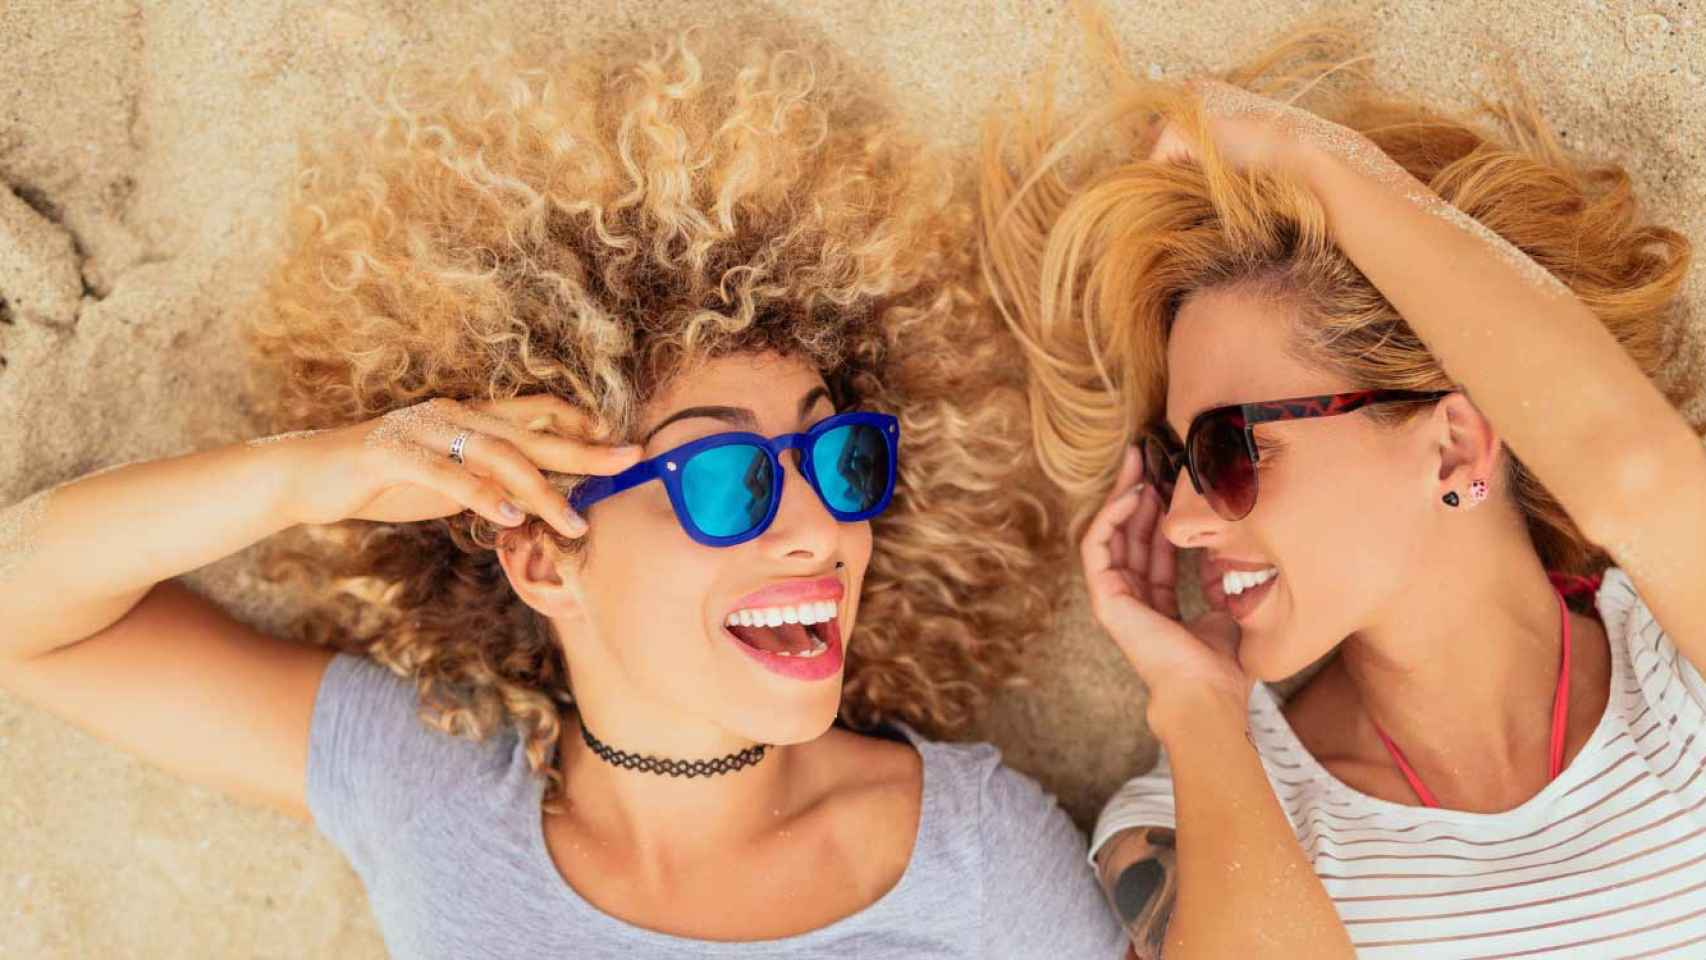 David Lesur presenta las cinco tendencias capilares para lucir este verano.